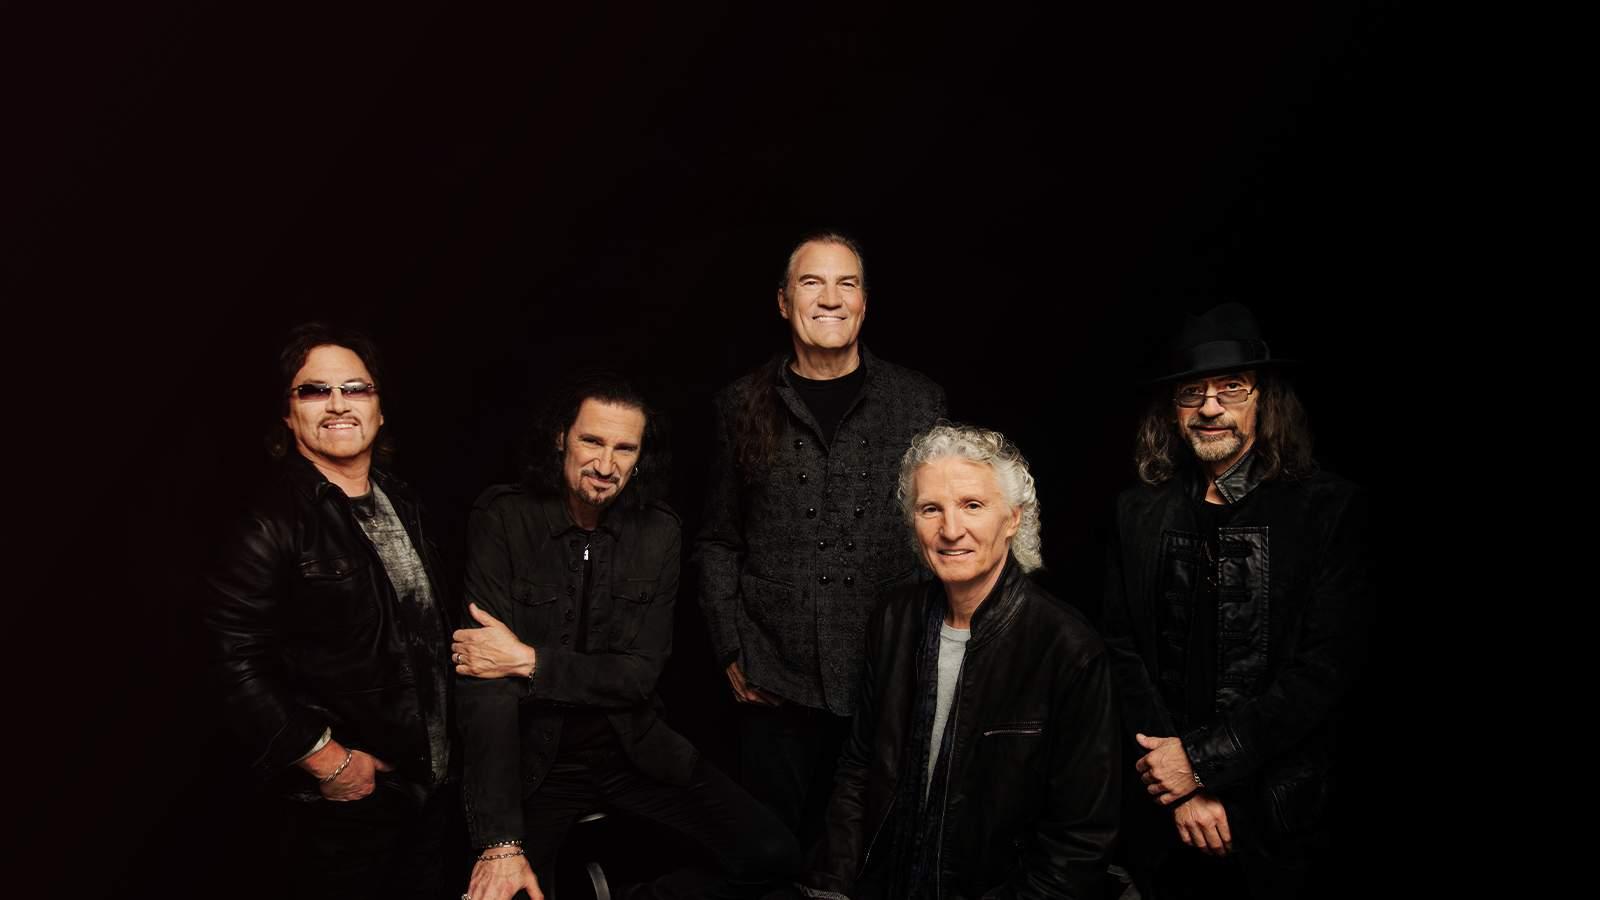 Grand Funk Railroad (18+ Event) (Rescheduled from 6/12/2020, 9/12/2020)